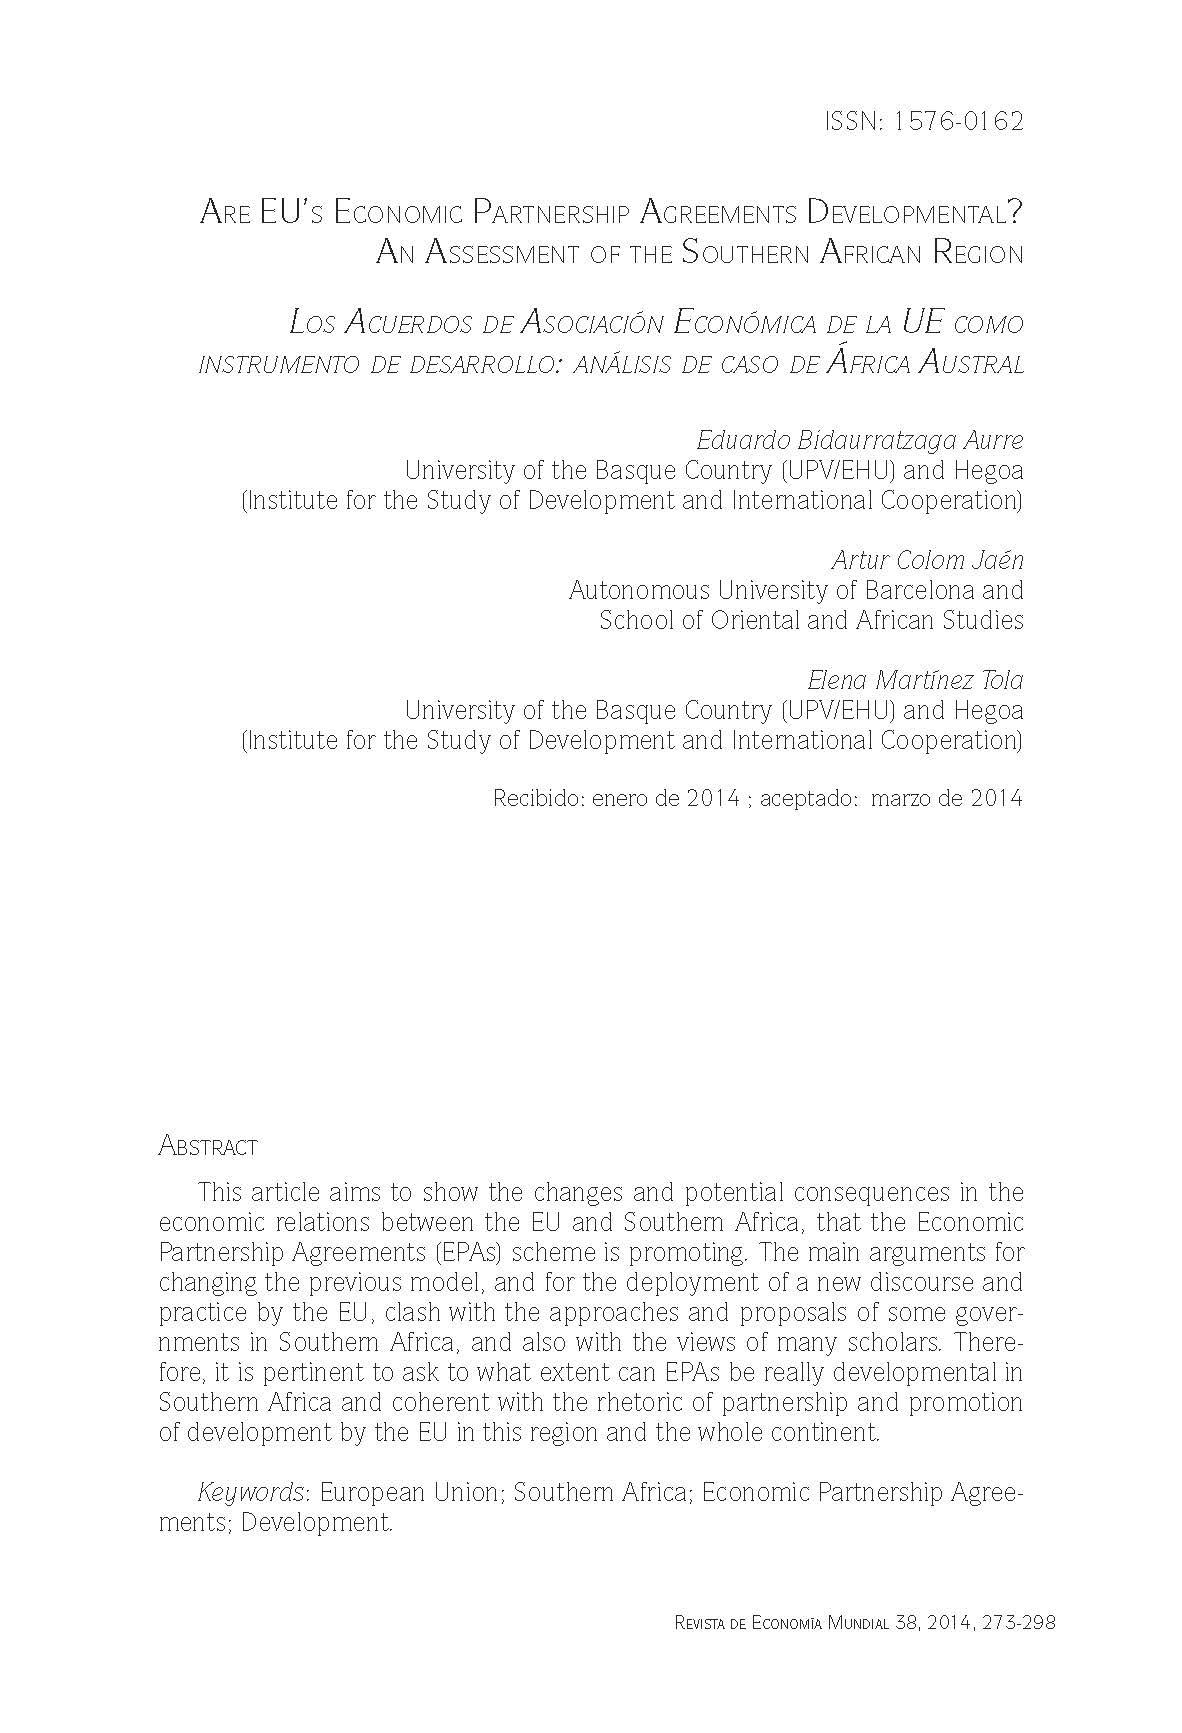 Are Eus Economic Partnership Agreements Developmental An